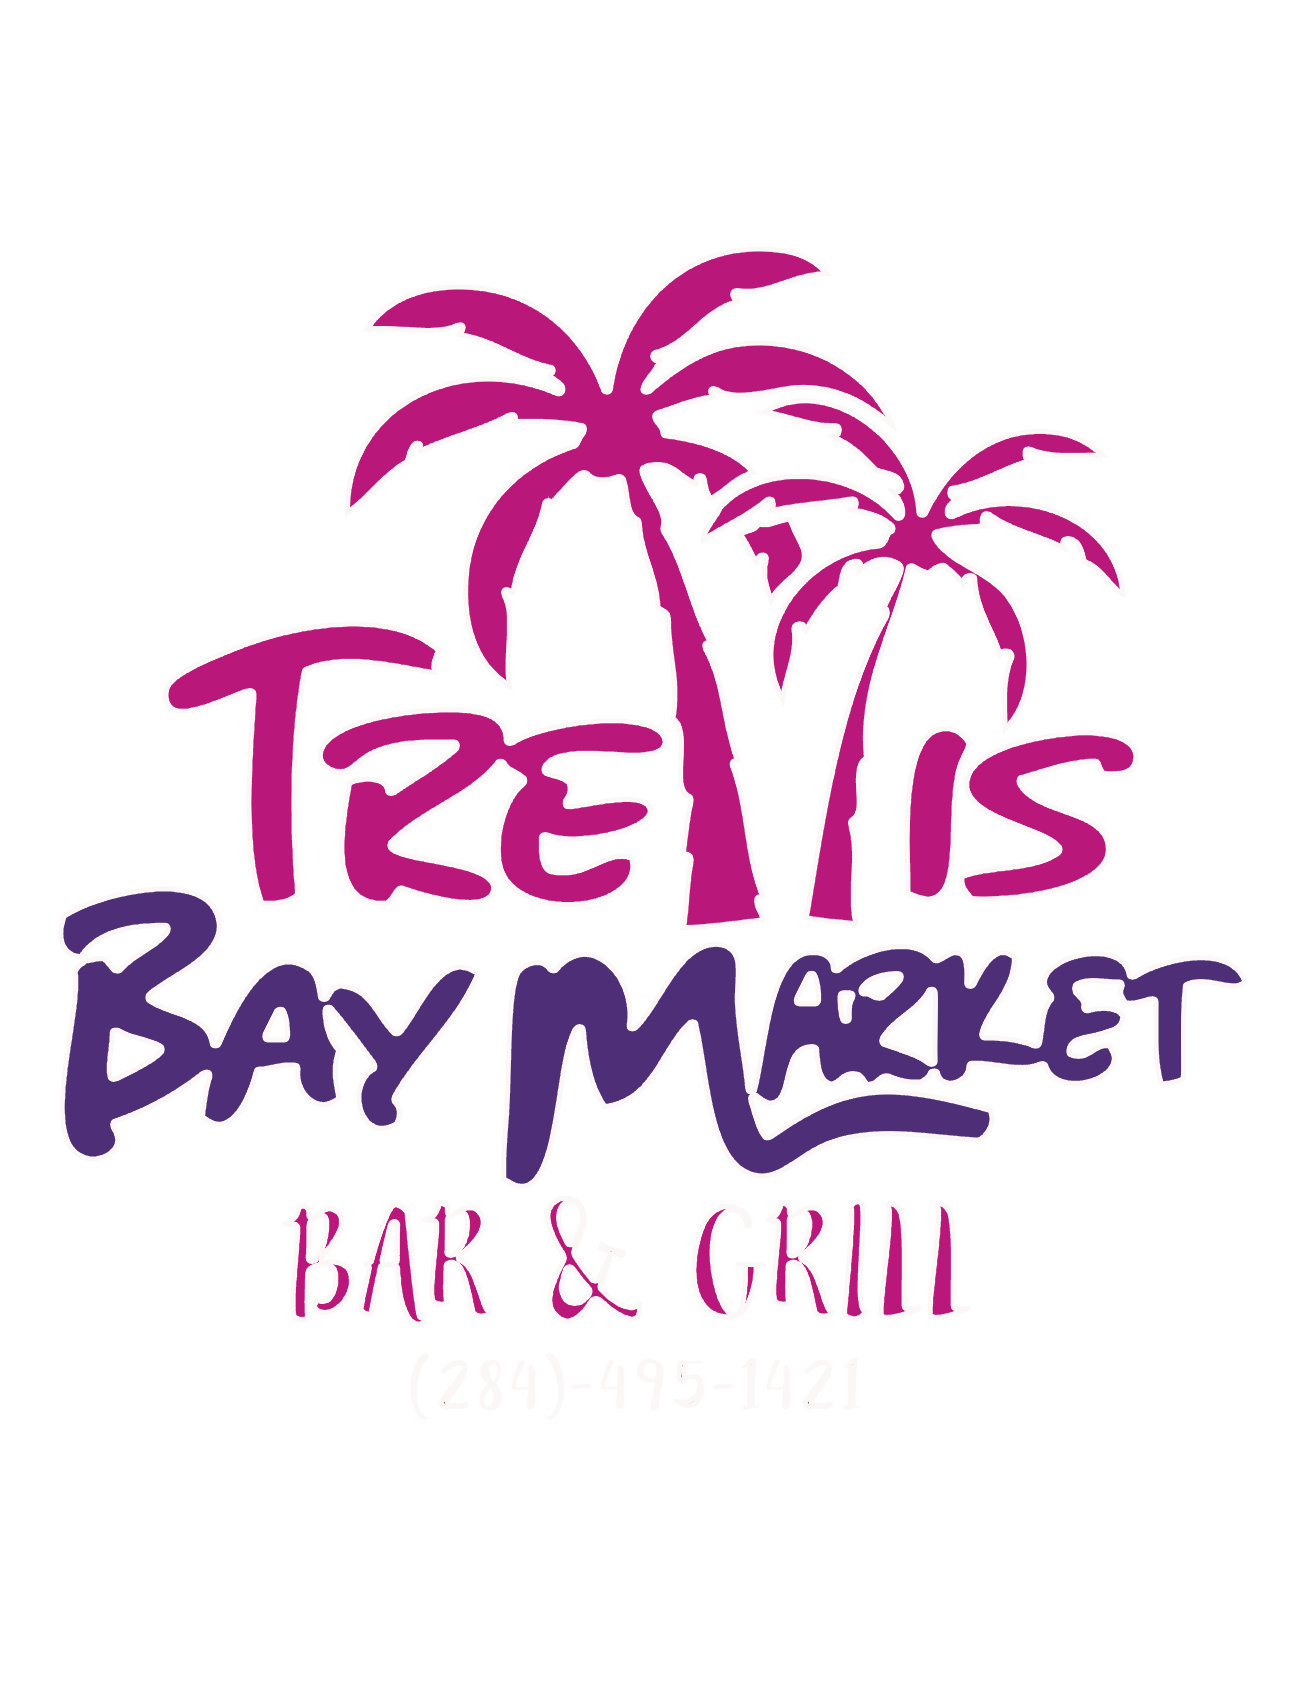 Trellis Bay Market Bar & Grill